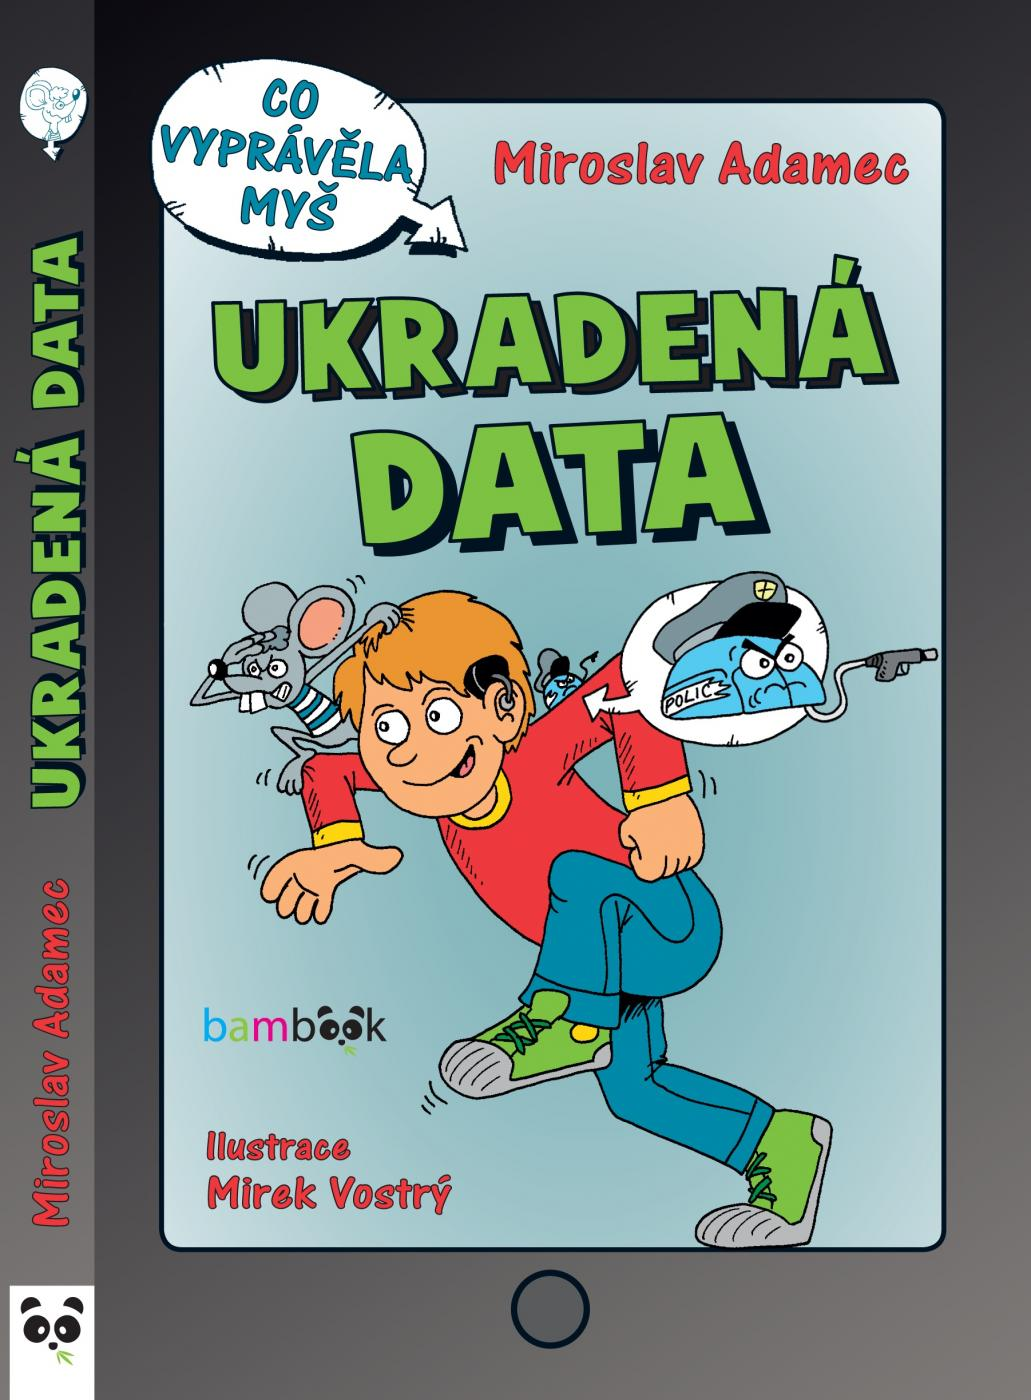 Ukradena Data Mirek Vostry